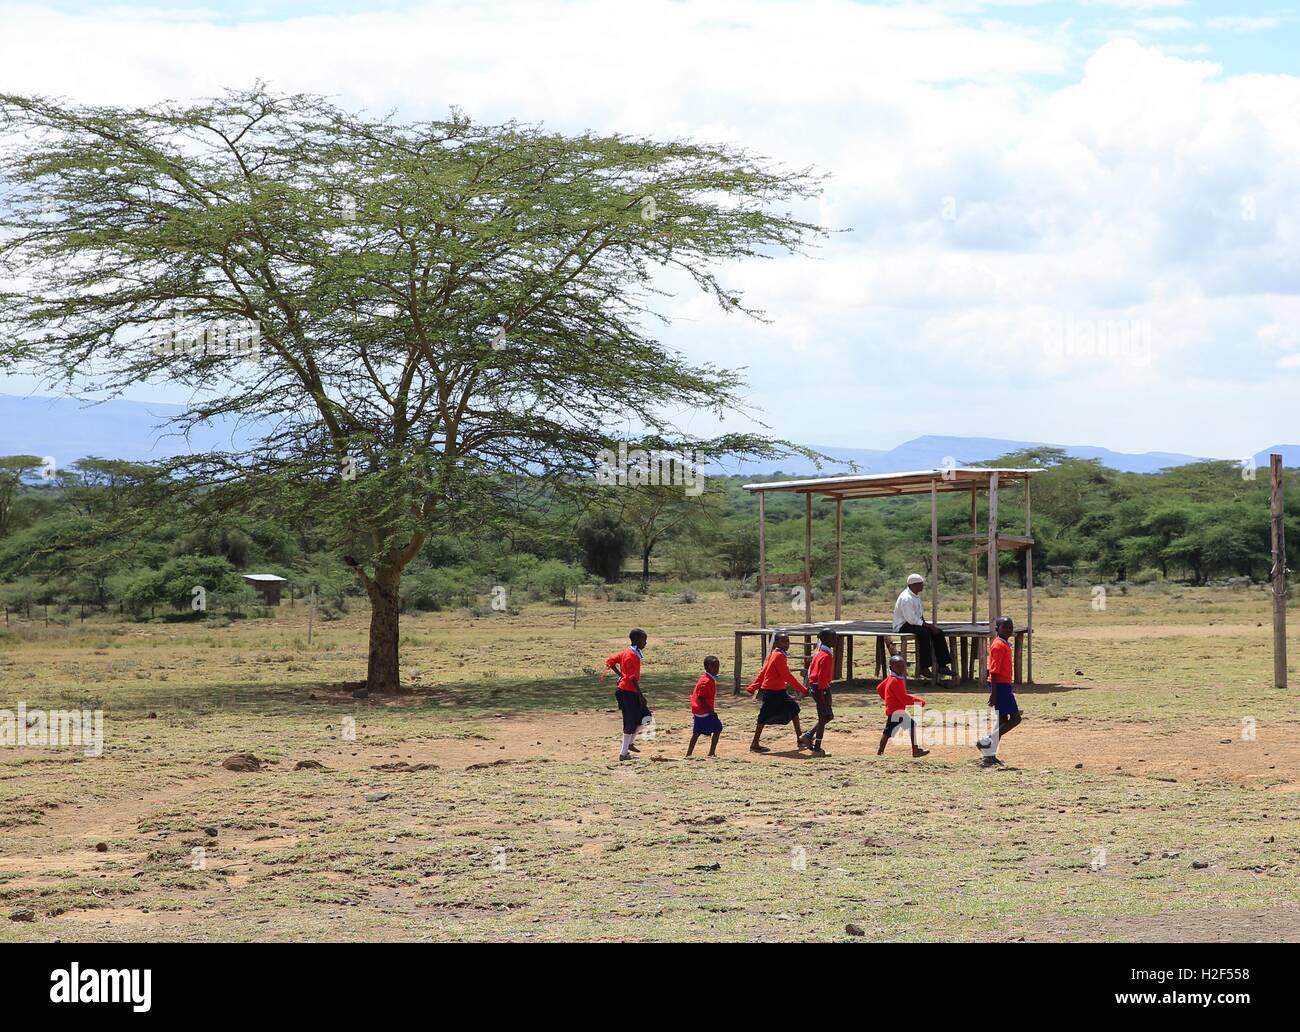 Kajiado, Kenya. 28th Oct, 2016. Students walk on campus at Olgumi primary school in Kajiado county, Kenya, on Oct. Stock Photo